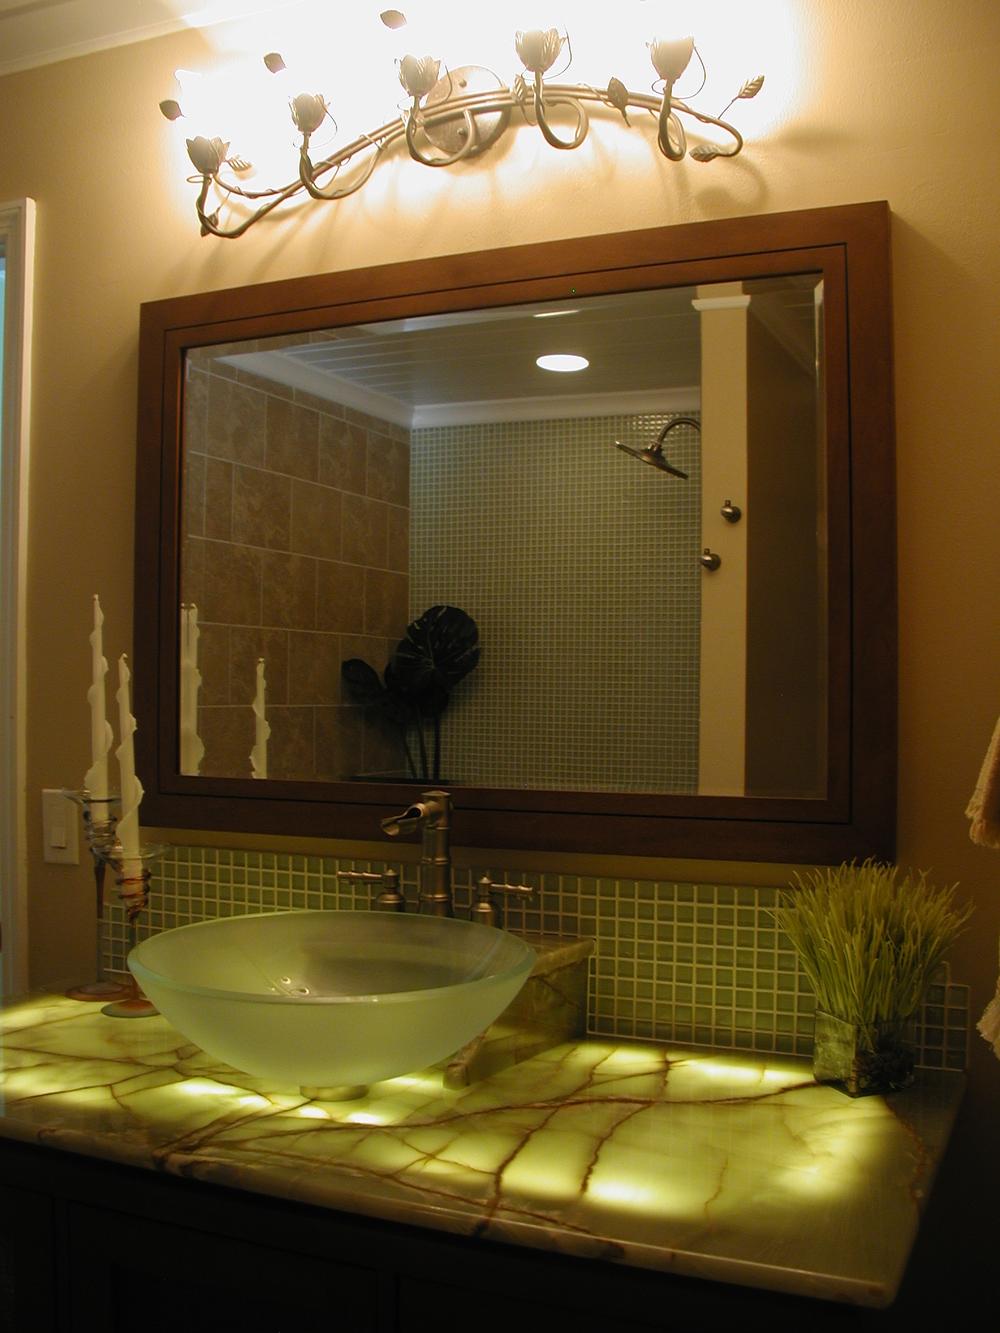 Zuba Hse 1 M Bath Vanity 3.JPG